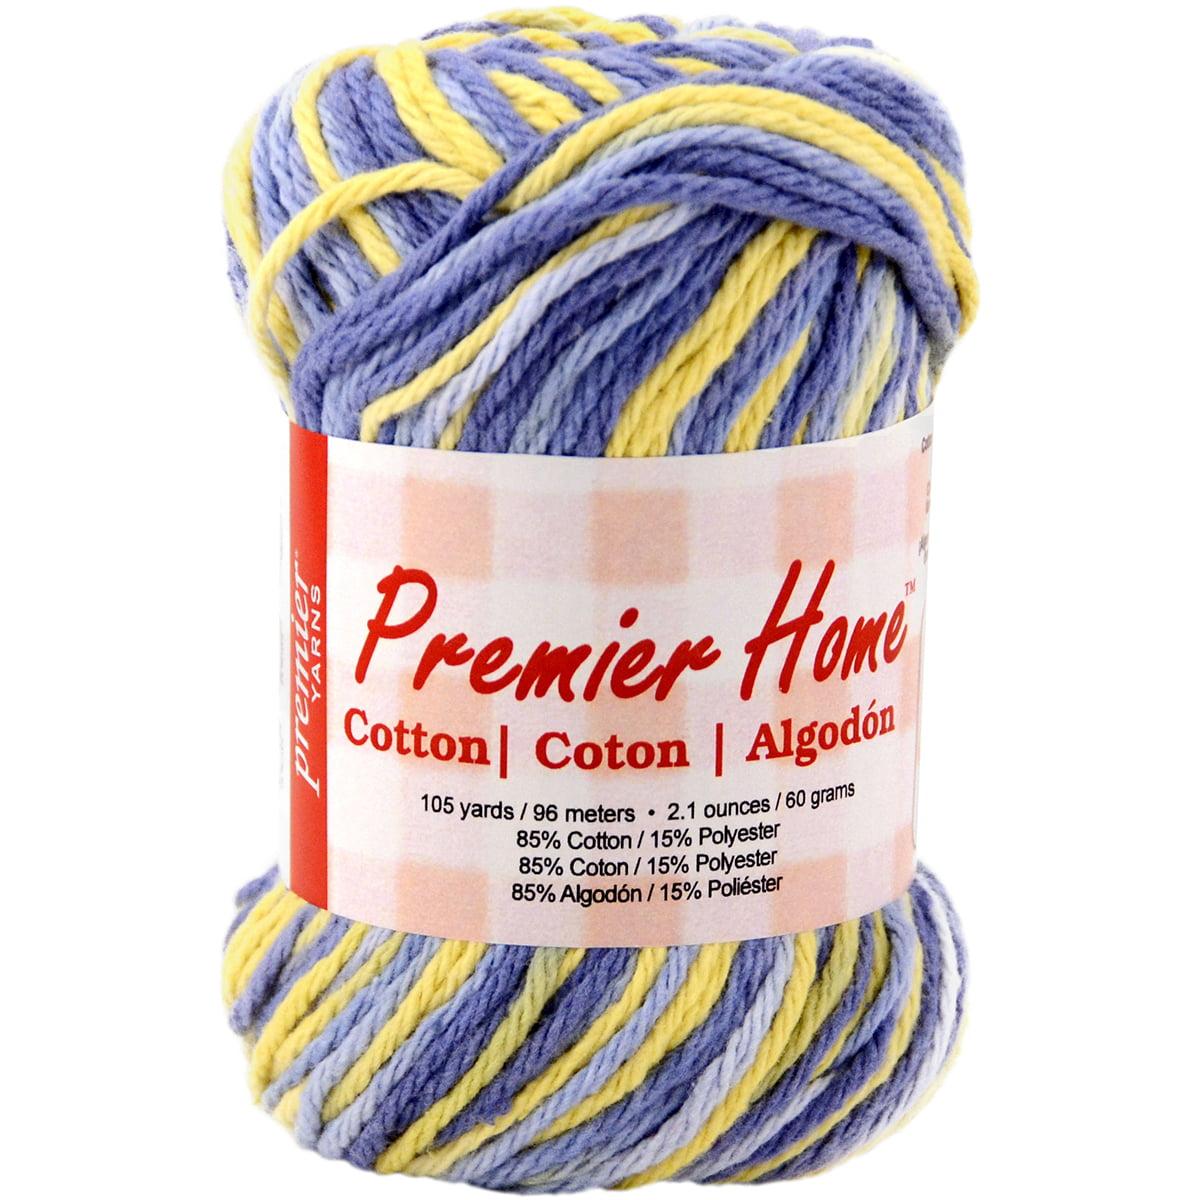 Home Cotton Yarn, Multicolored, Summer Kitchen